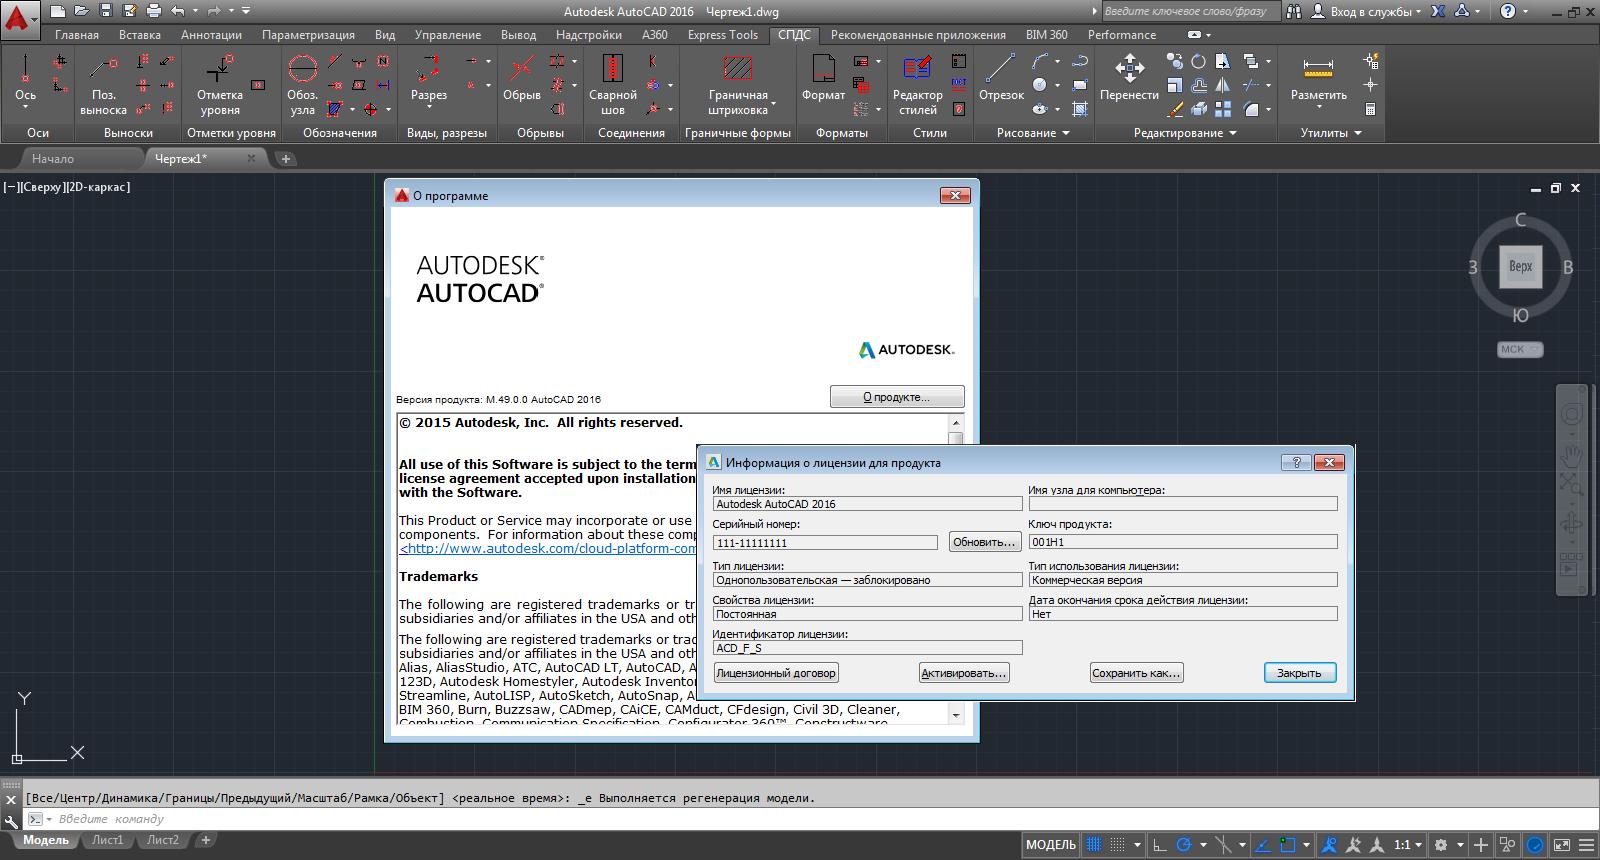 Autodesk autocad 2016 ru x86 x64portal.esoo.ru